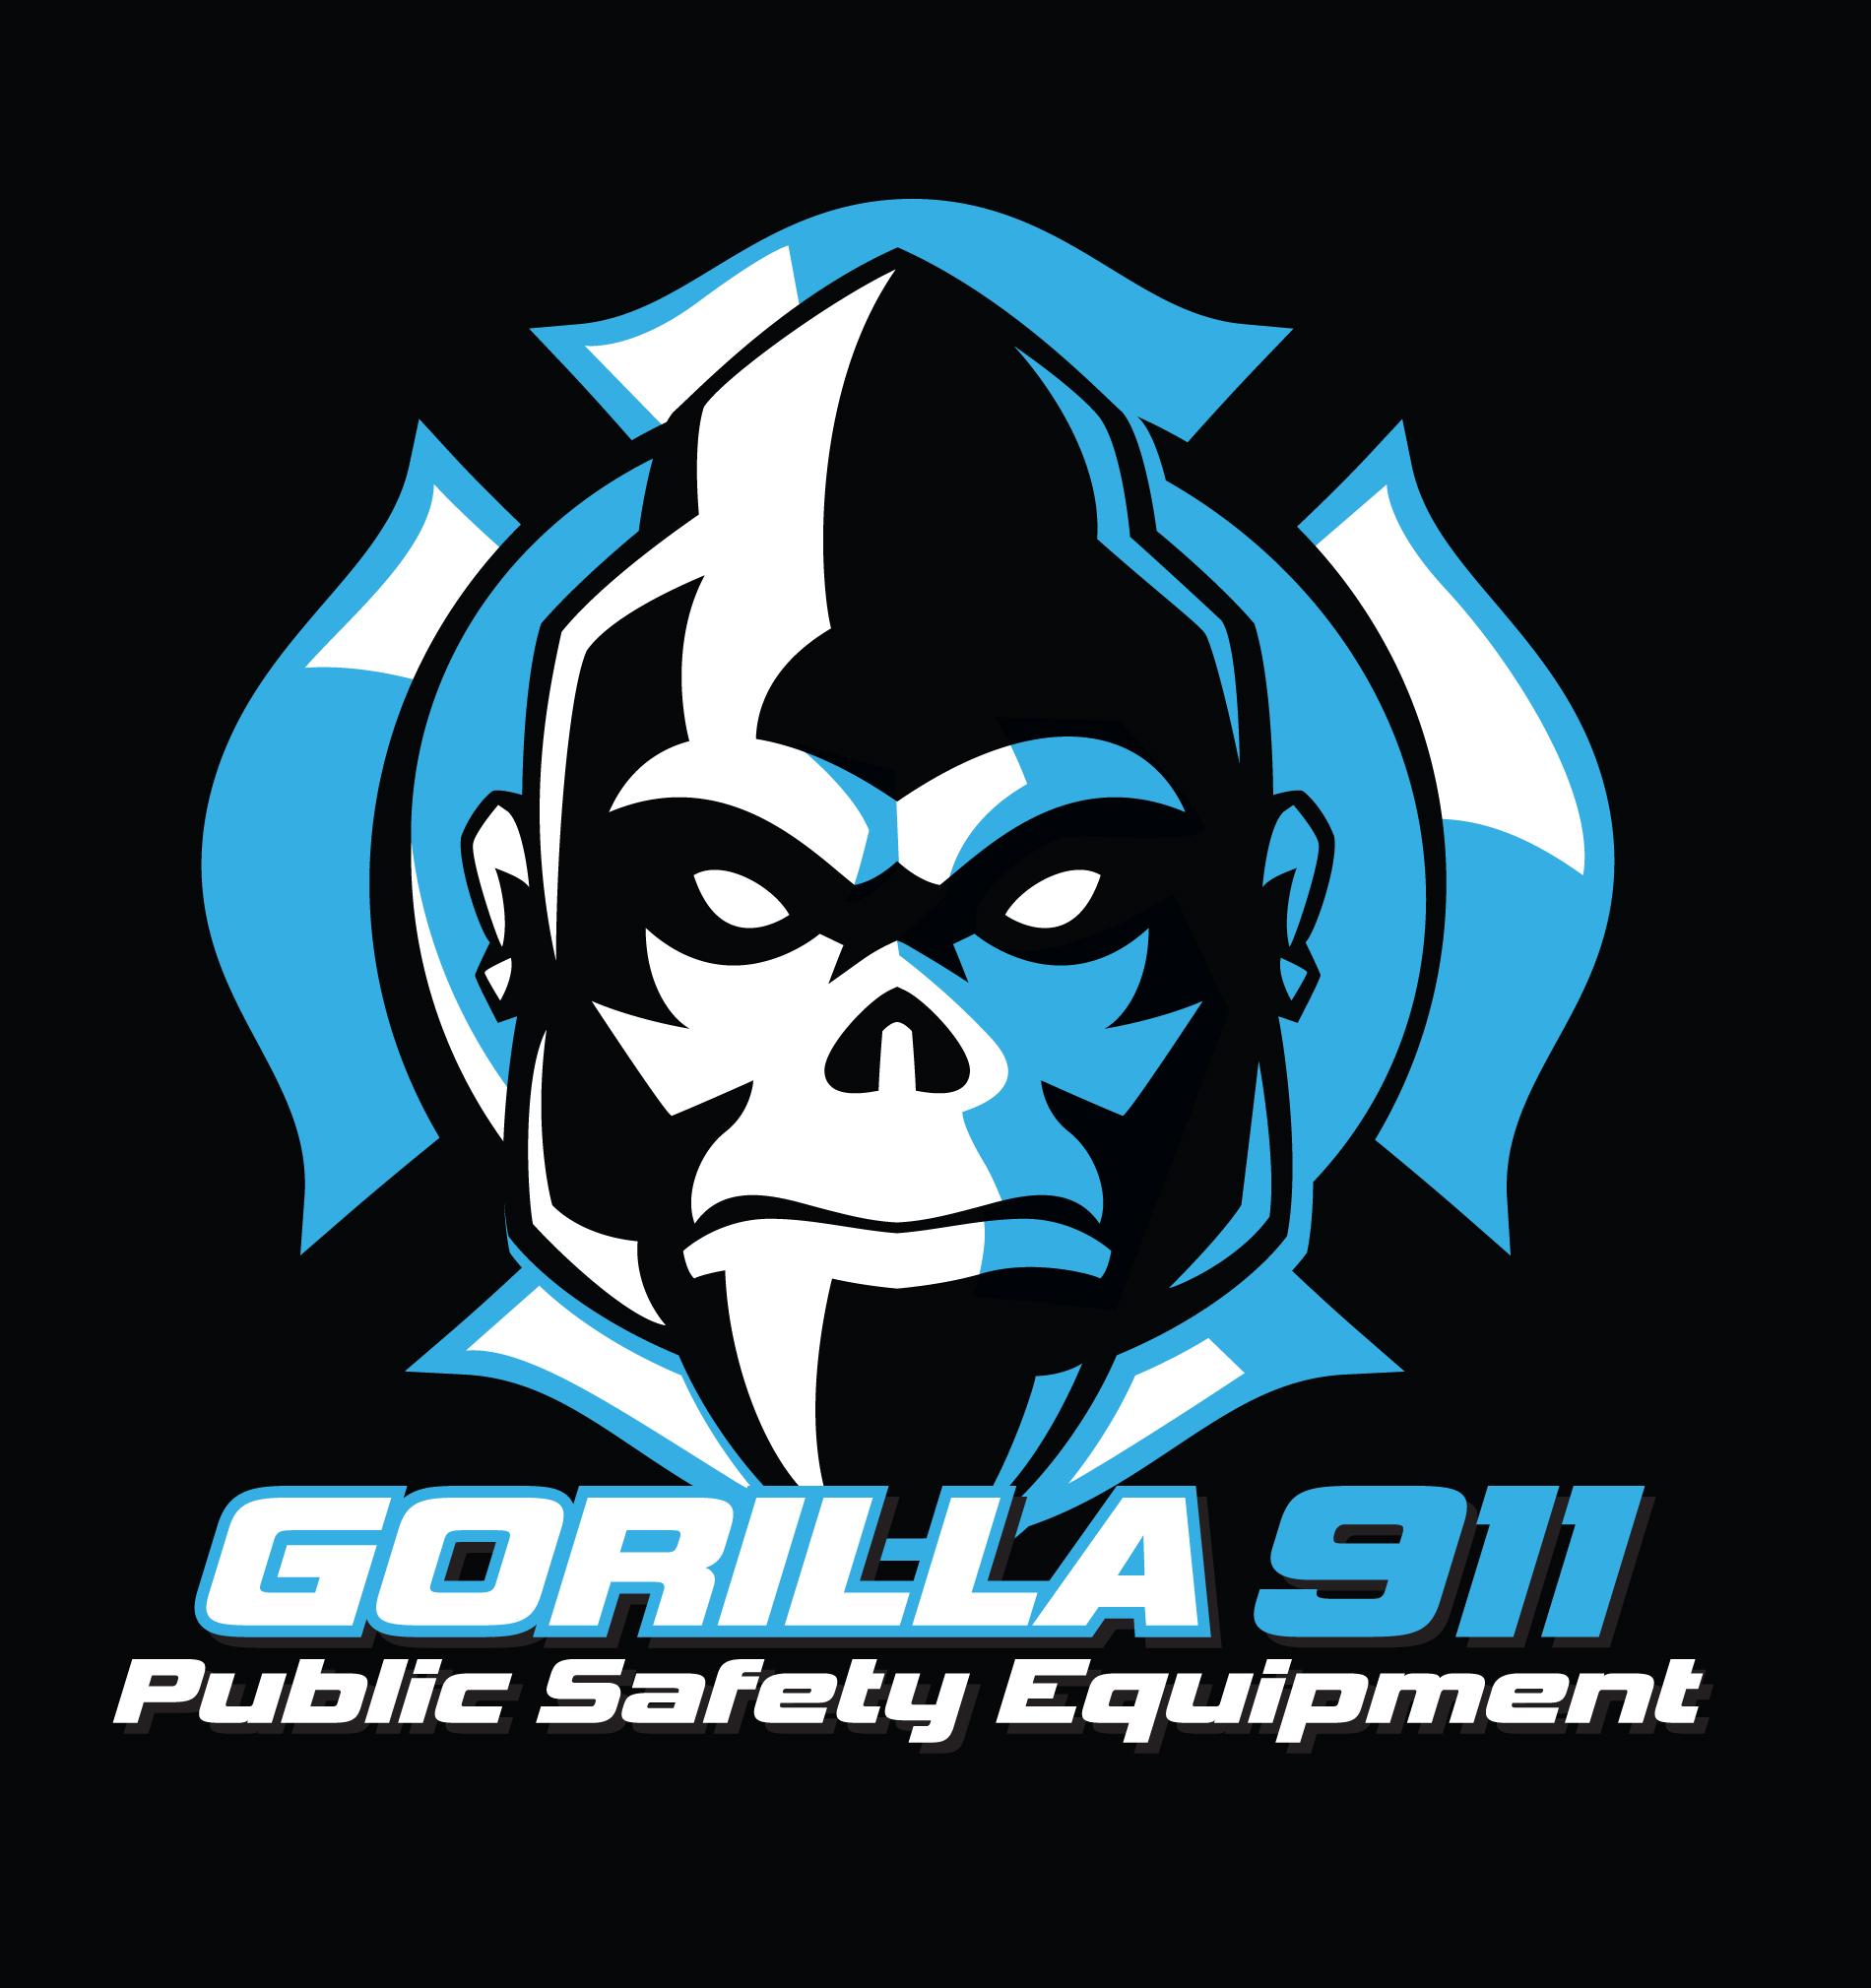 gorilla 911 shirt (blue on black)